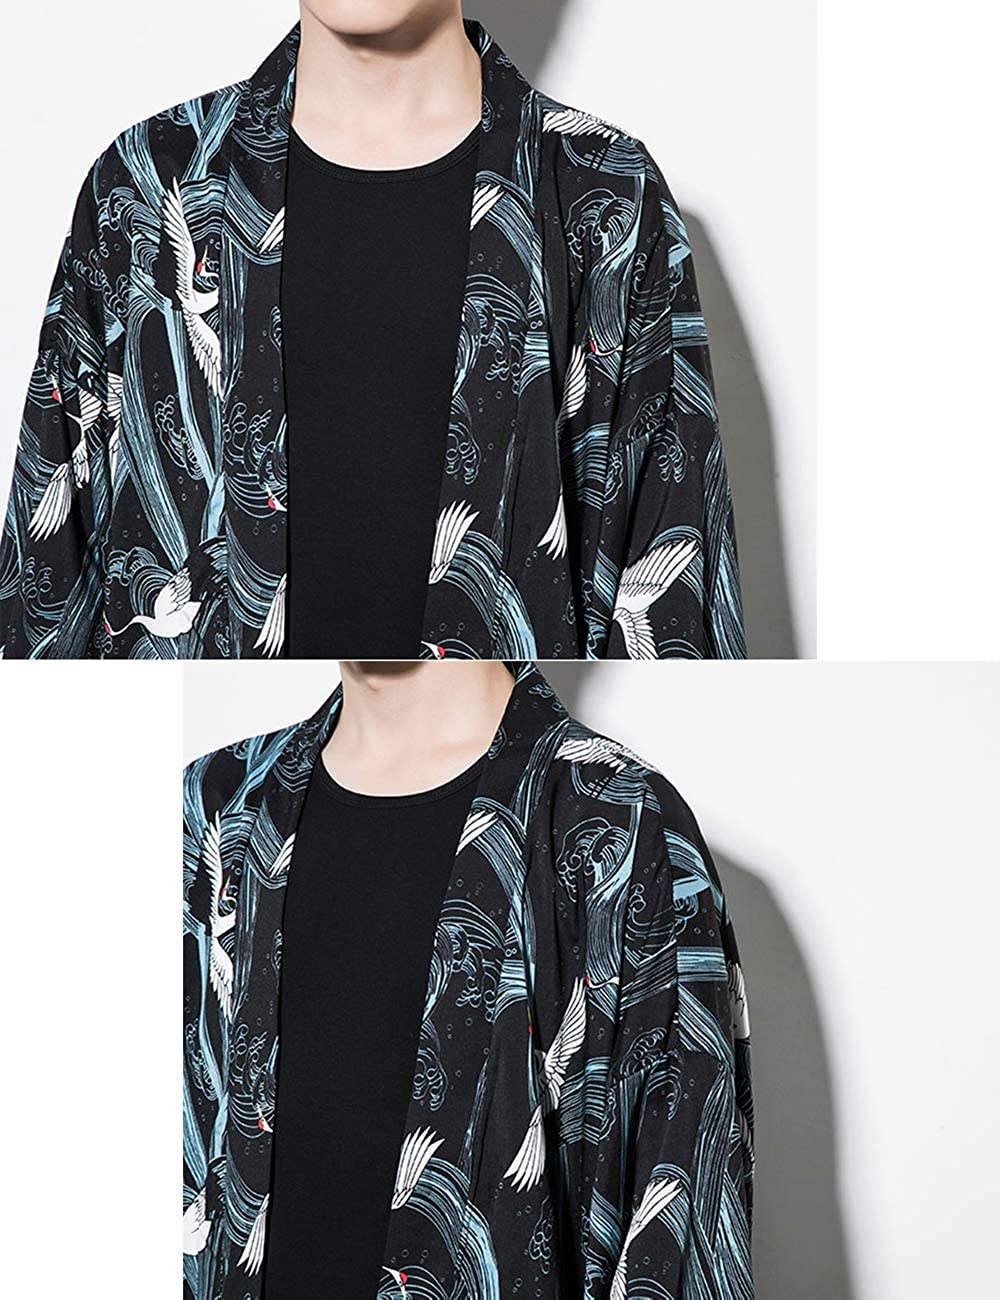 1b002b76b besbomig Chaqueta Haori de Verano Capa Ropa Japonesa de Moda para Hombre  Prendas de Abrigo Cardigan Kimono Hippie Ropa Casual